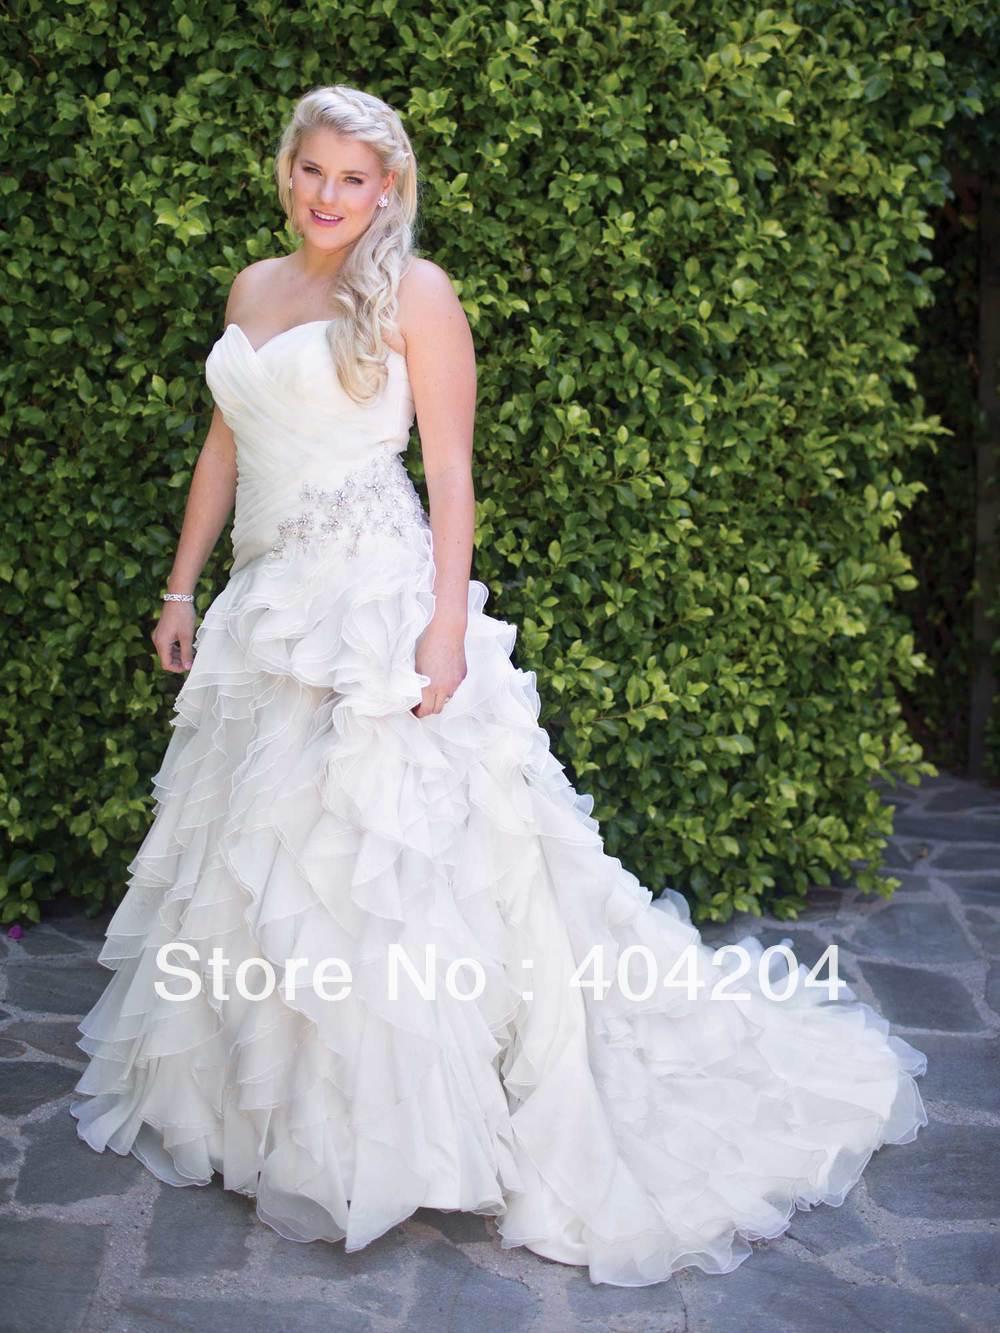 Rent A Plus Size Wedding Dress Welcome Wallsebot